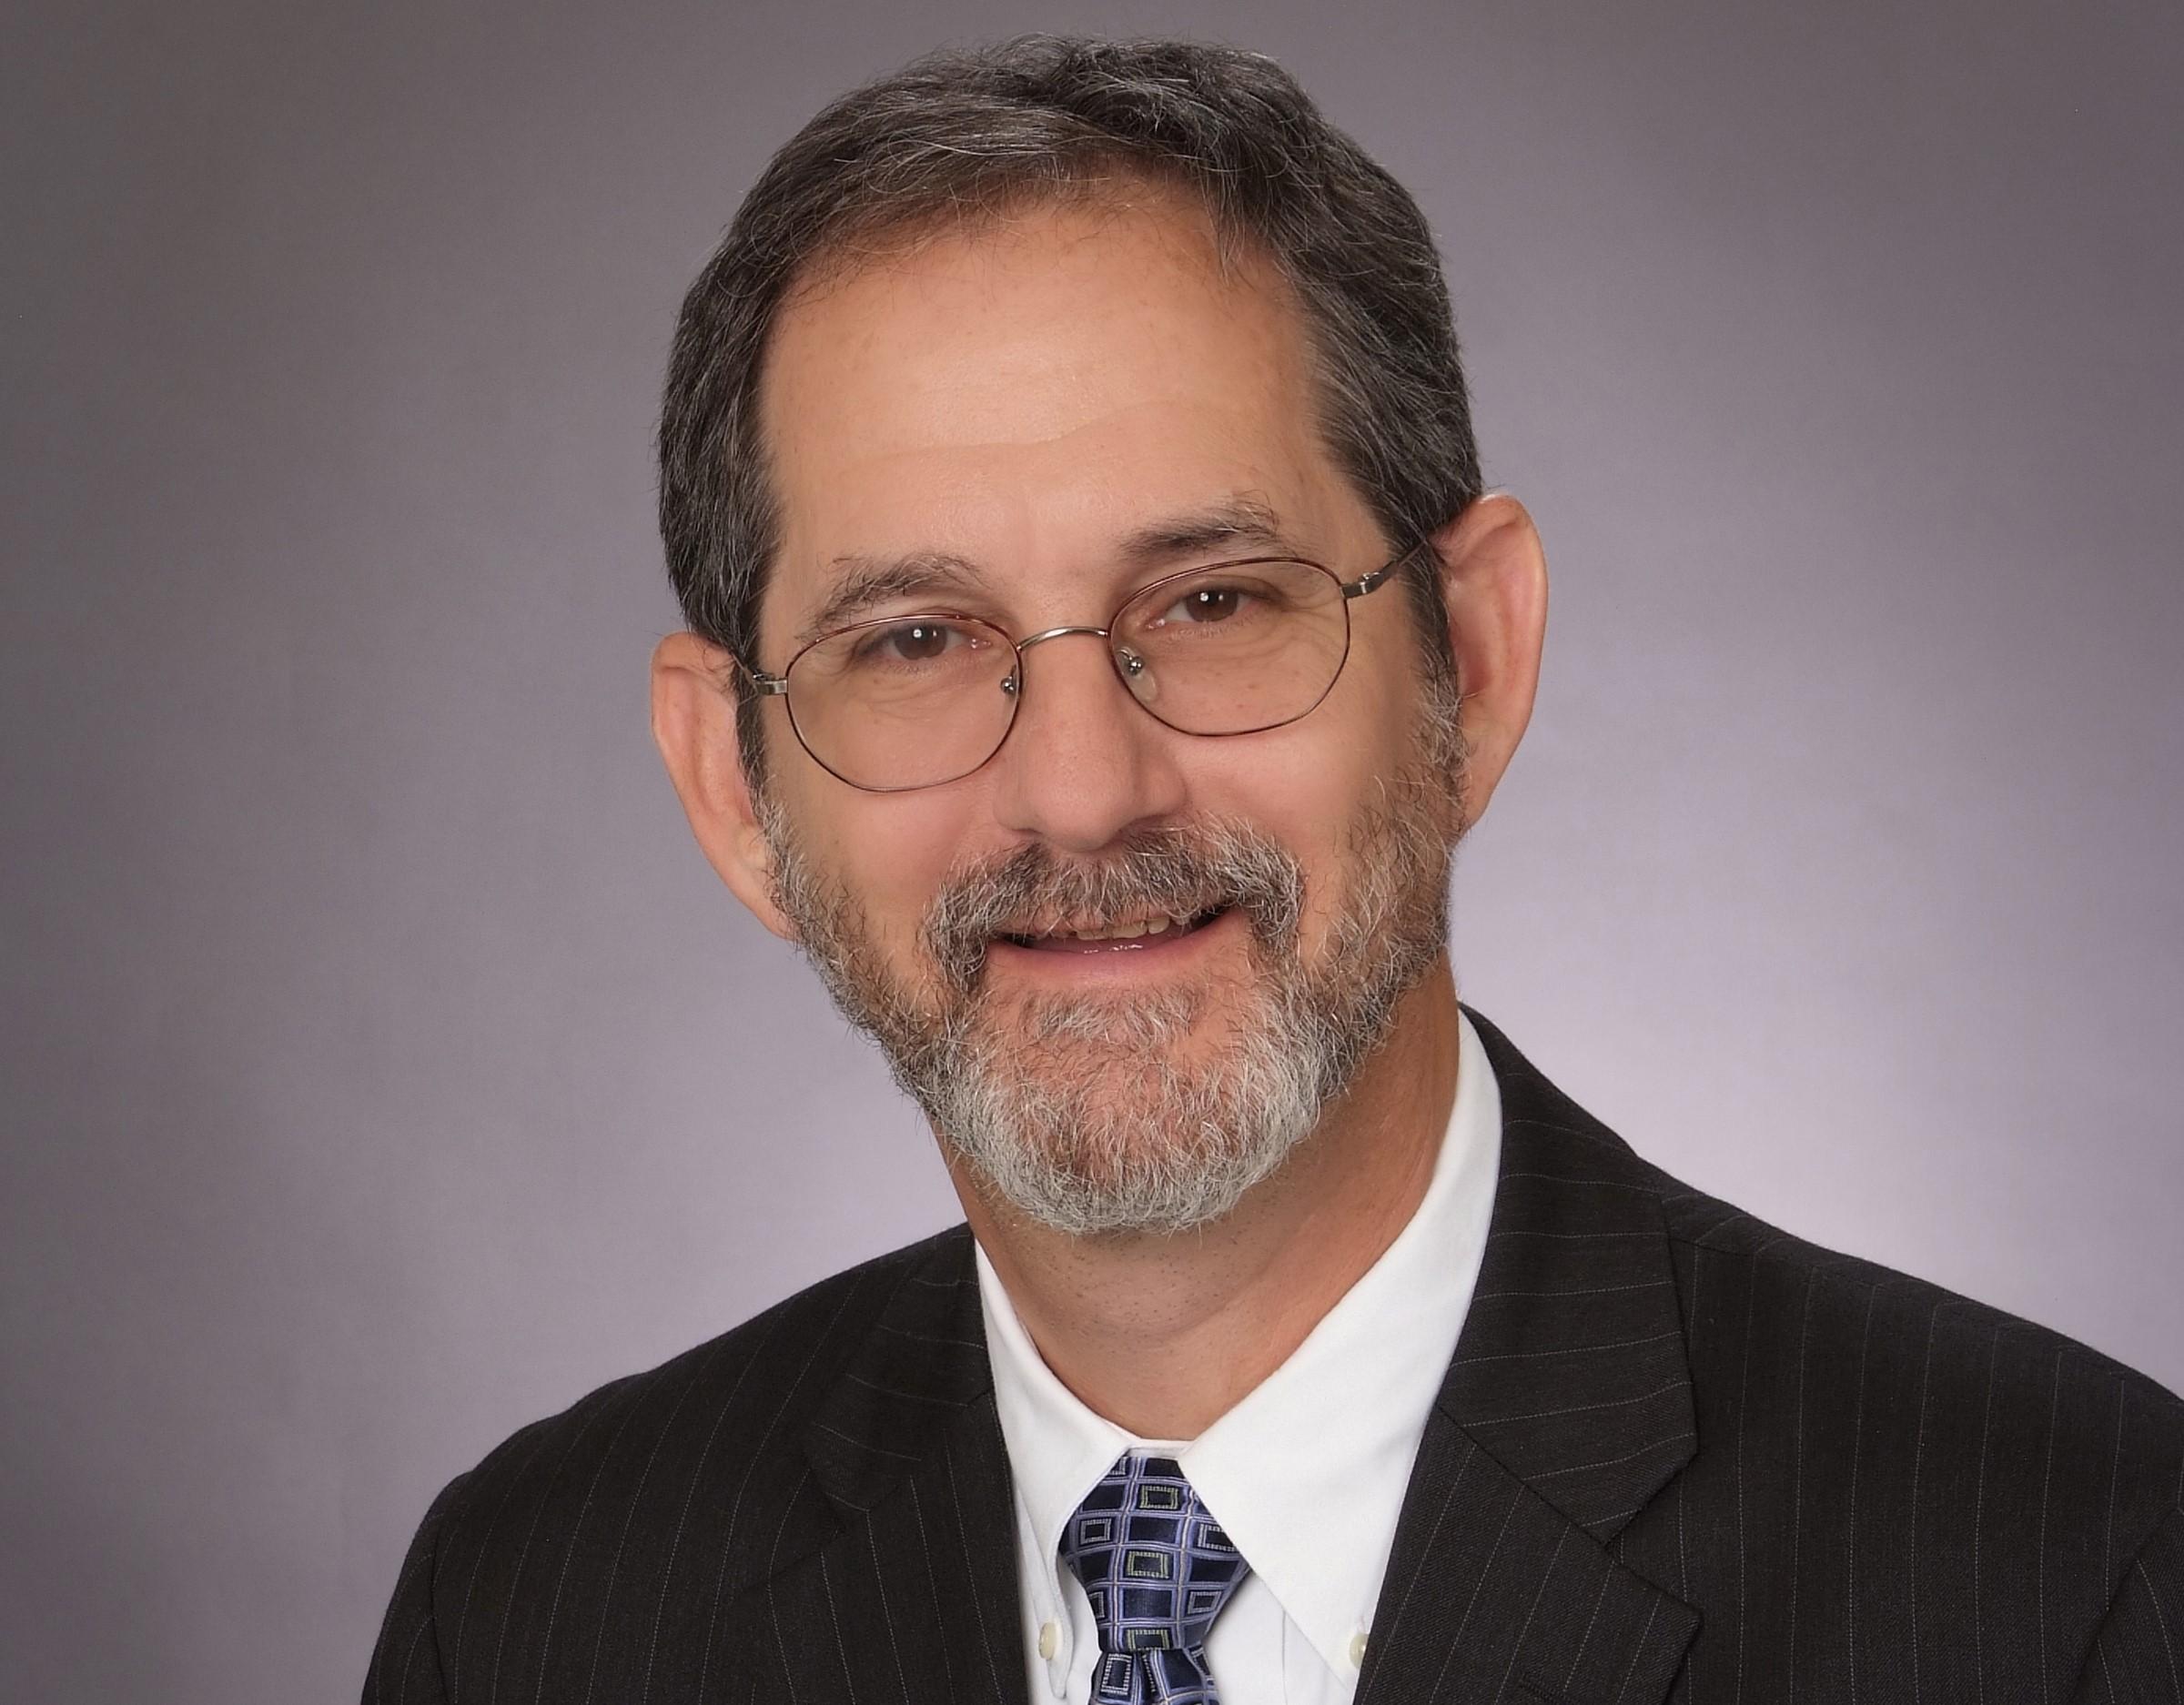 James Fierberg